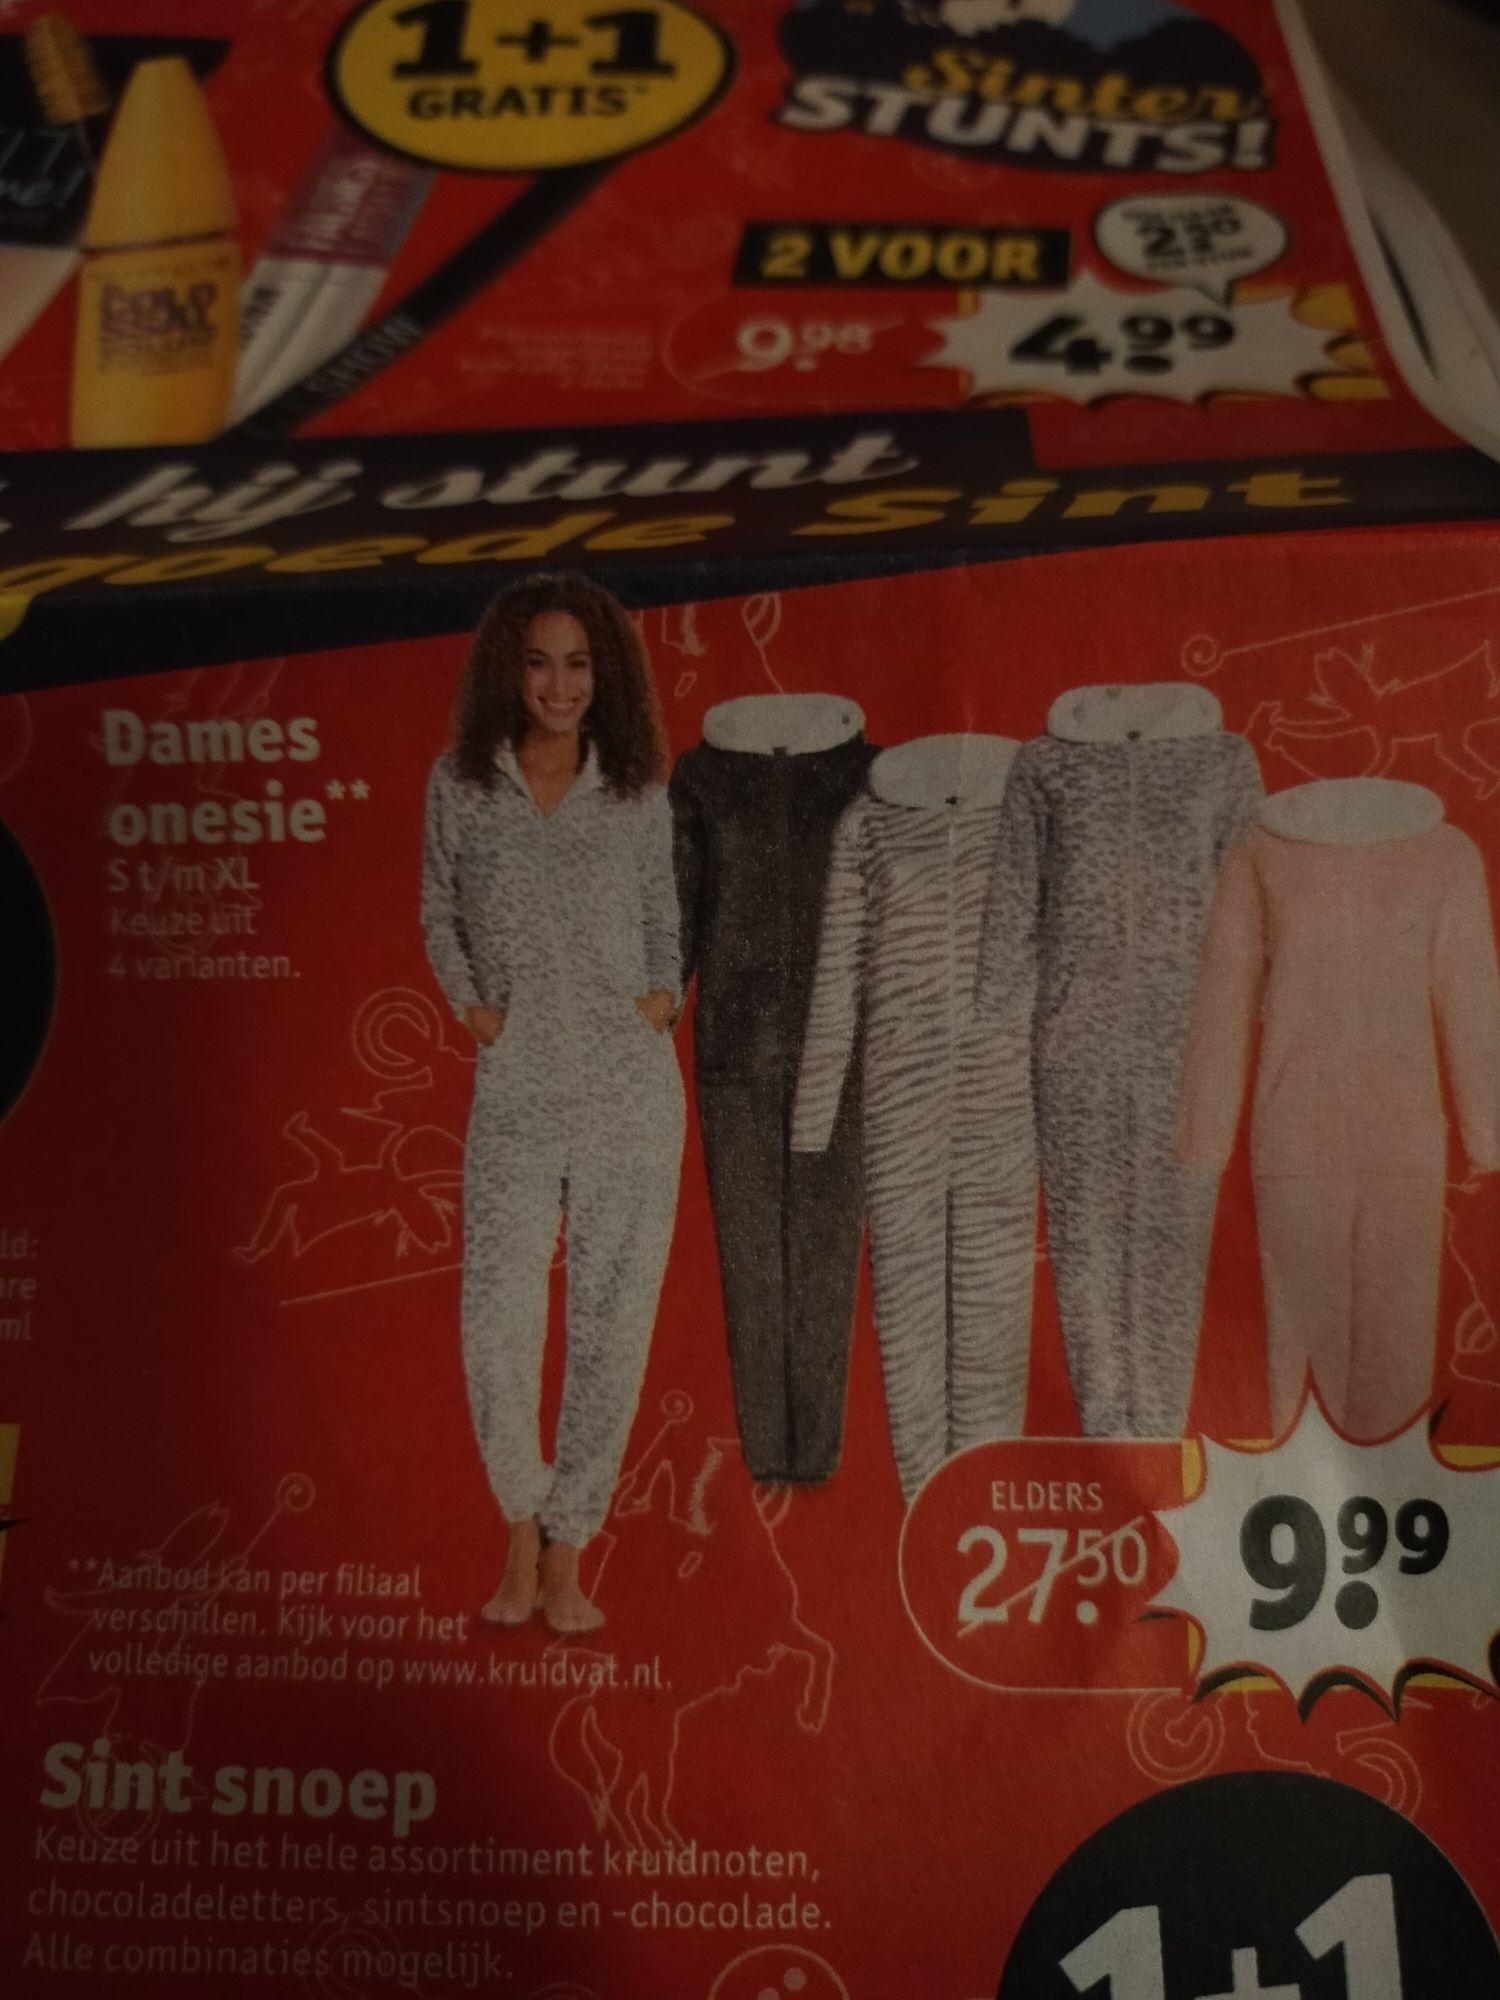 Kruidvat dames onesie